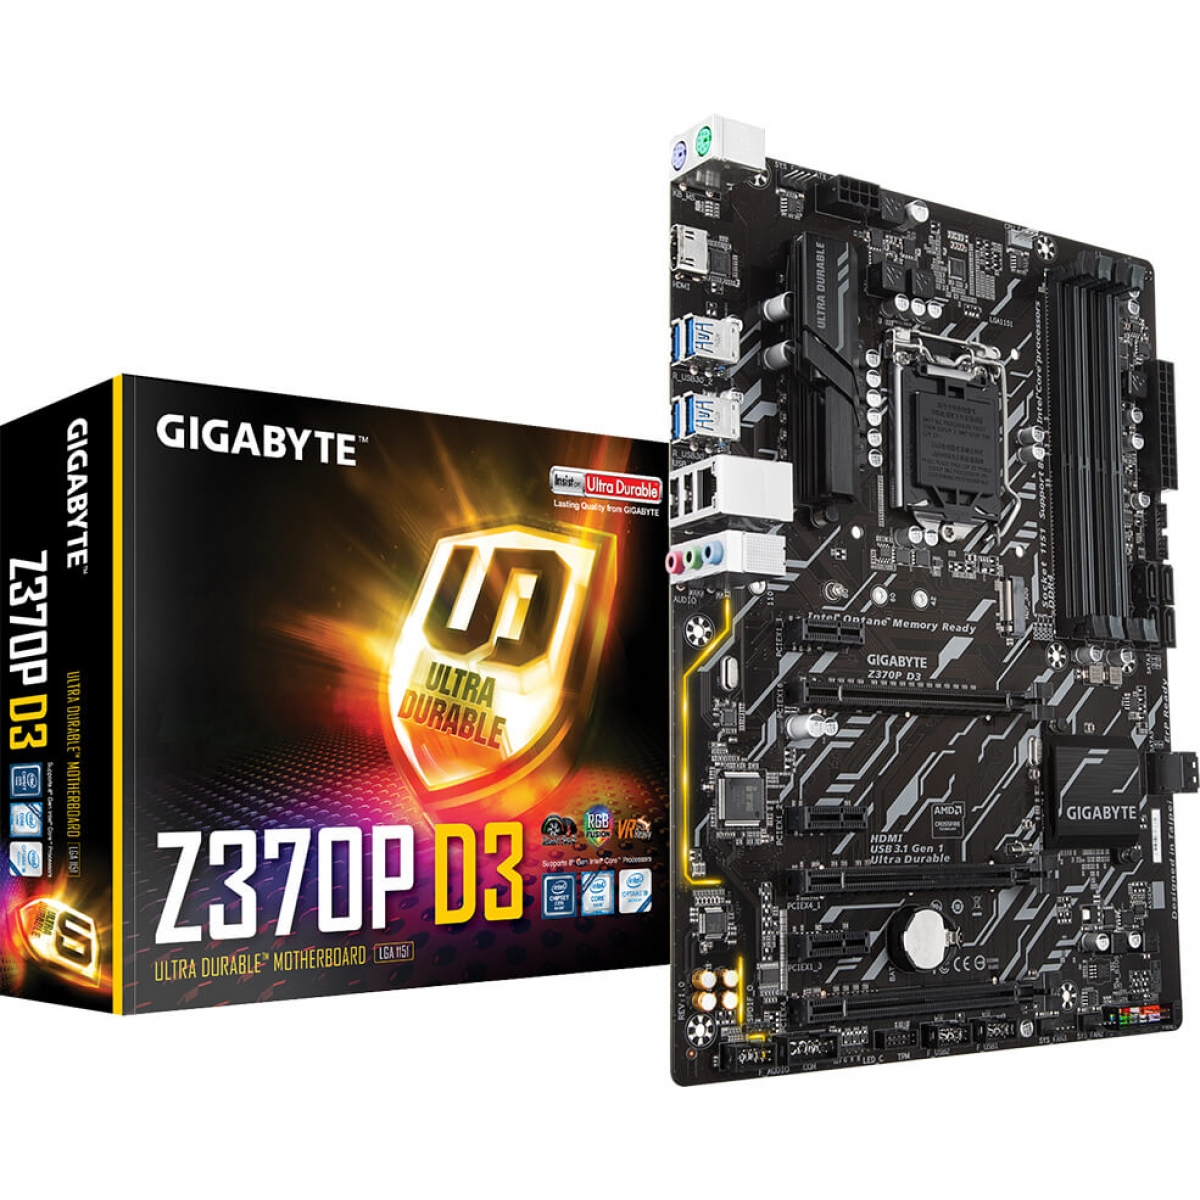 Placa Mãe Gigabyte Z370P D3, Chipset Z370, Intel LGA 1151, ATX, DDR4